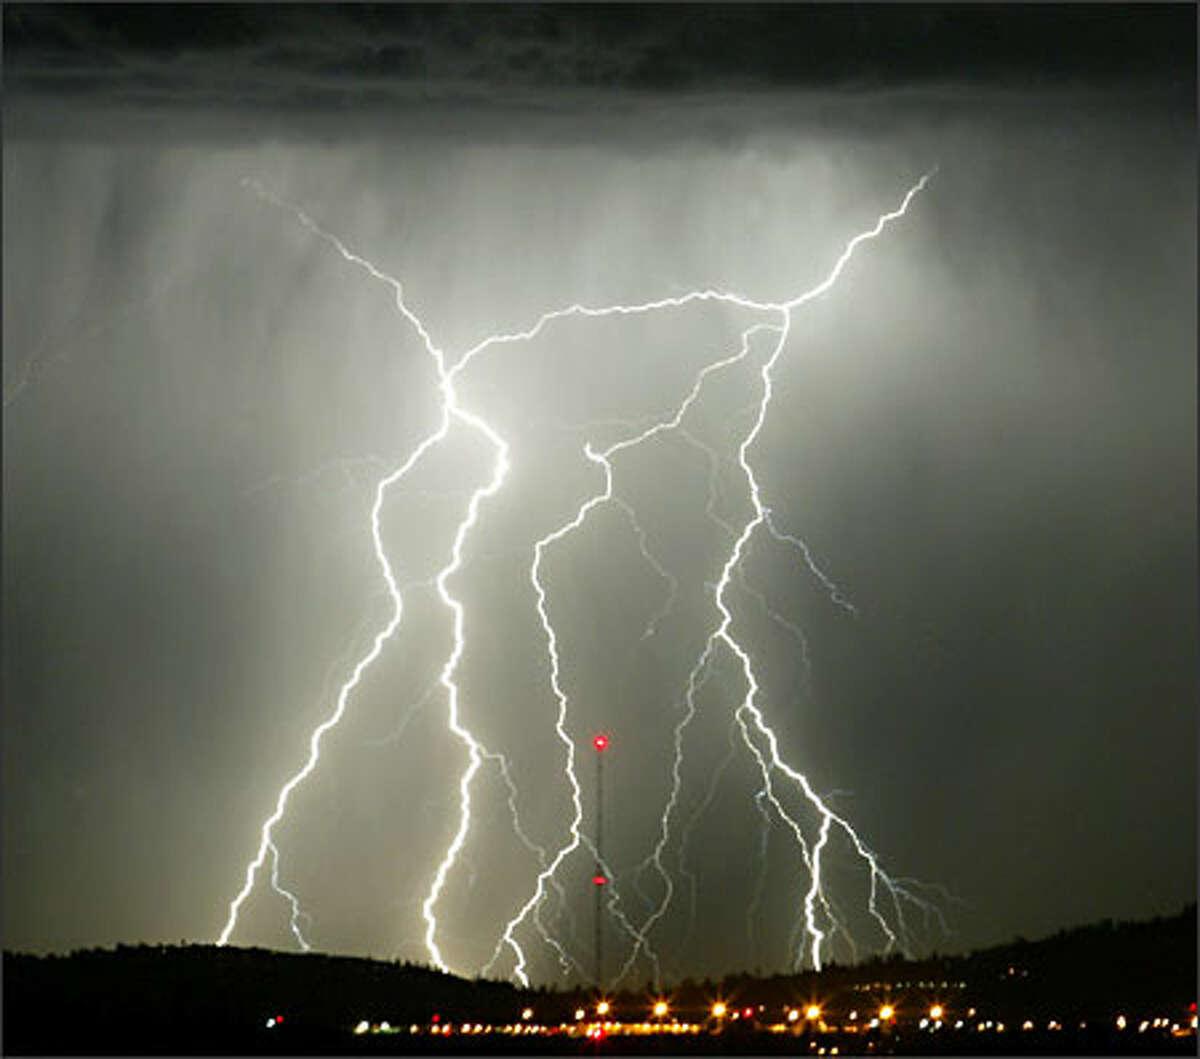 Lightning strikes the Cascade foothills as seen from Vashon Island.